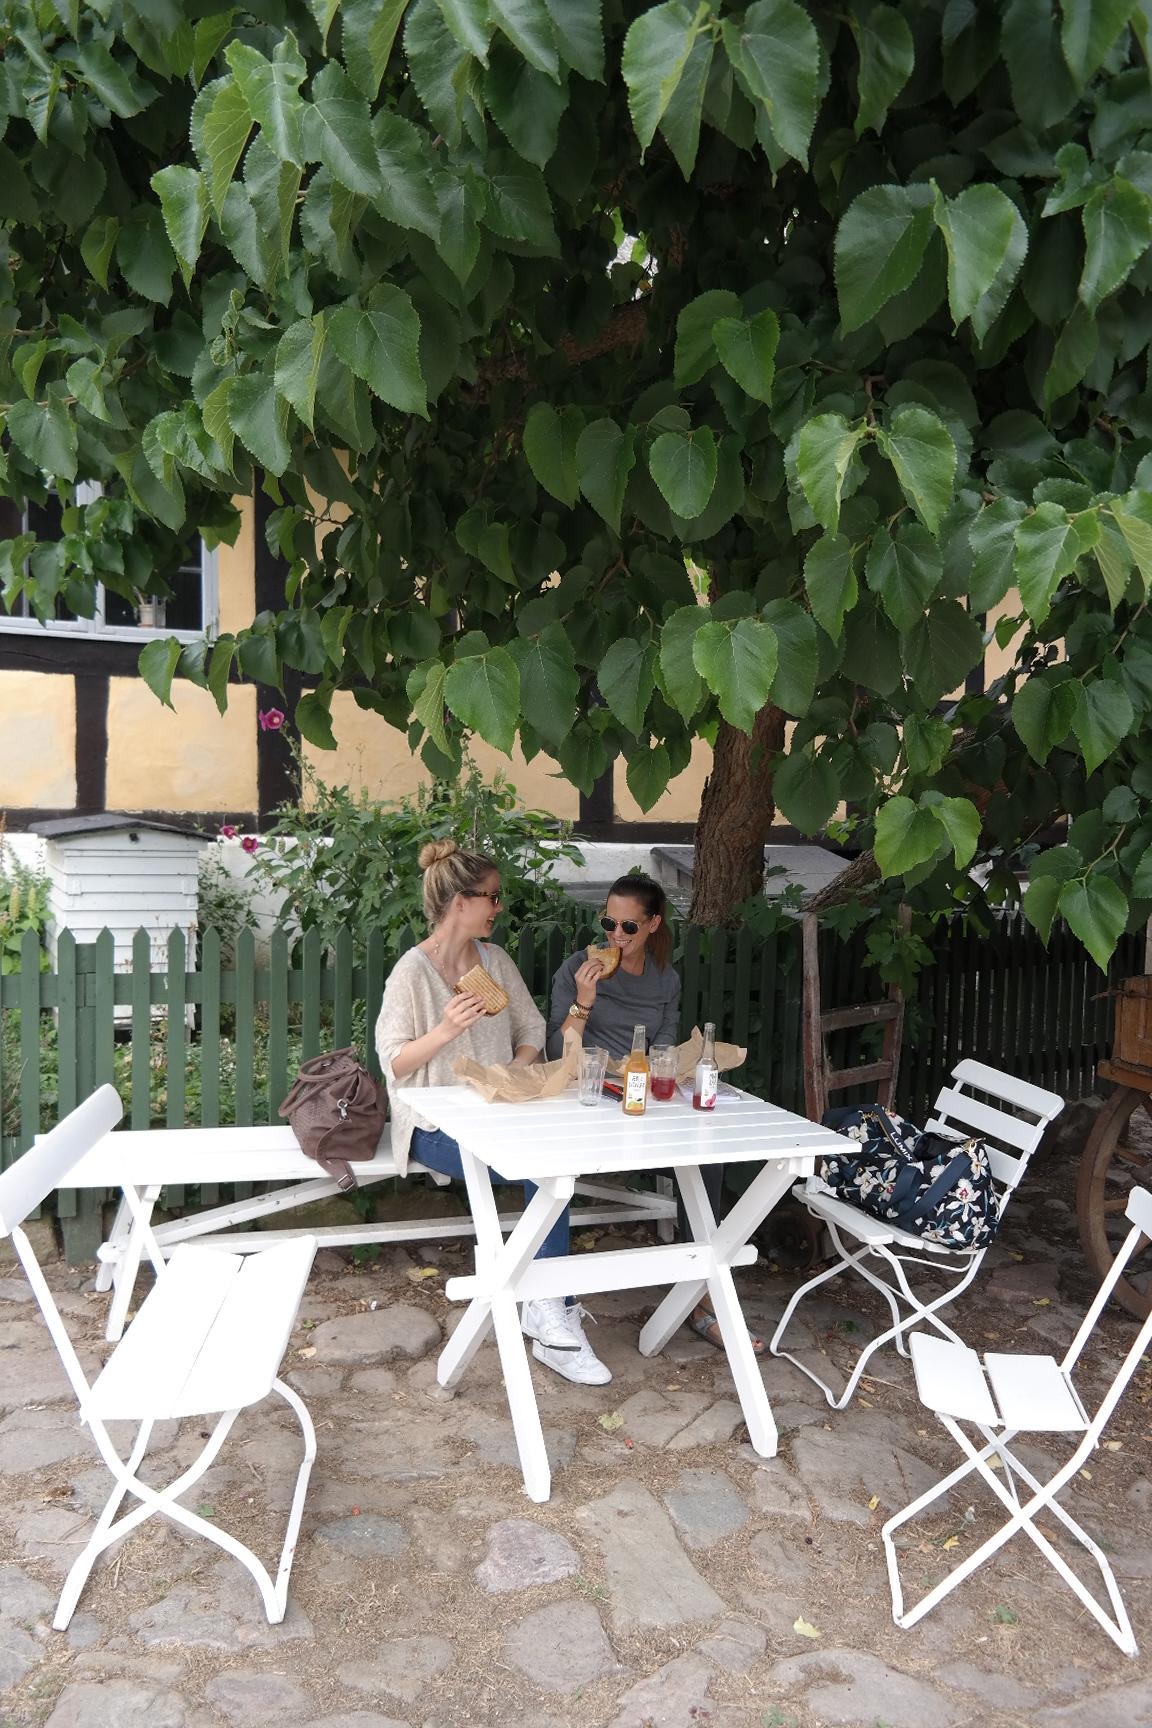 MissBBontour Missbonnebonne Reiseblog Dänemark Camping Urlaub Bornholm kulinarisch Tipps Gaarden Madskulturhaus